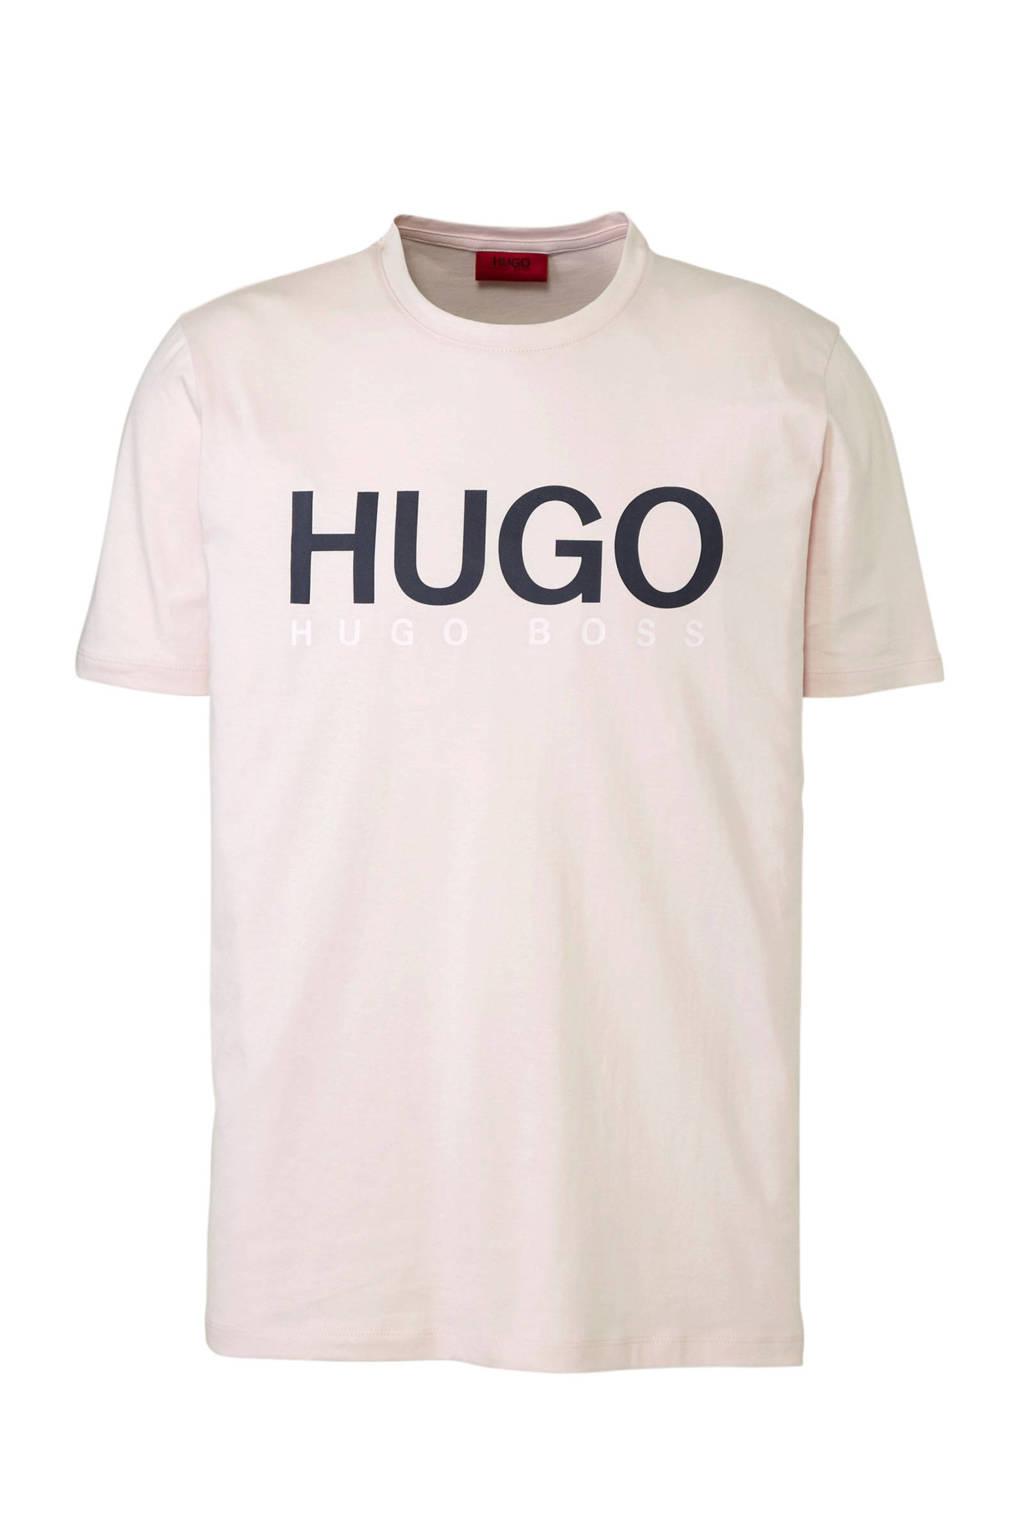 HUGO T-shirt met logo roze, Roze